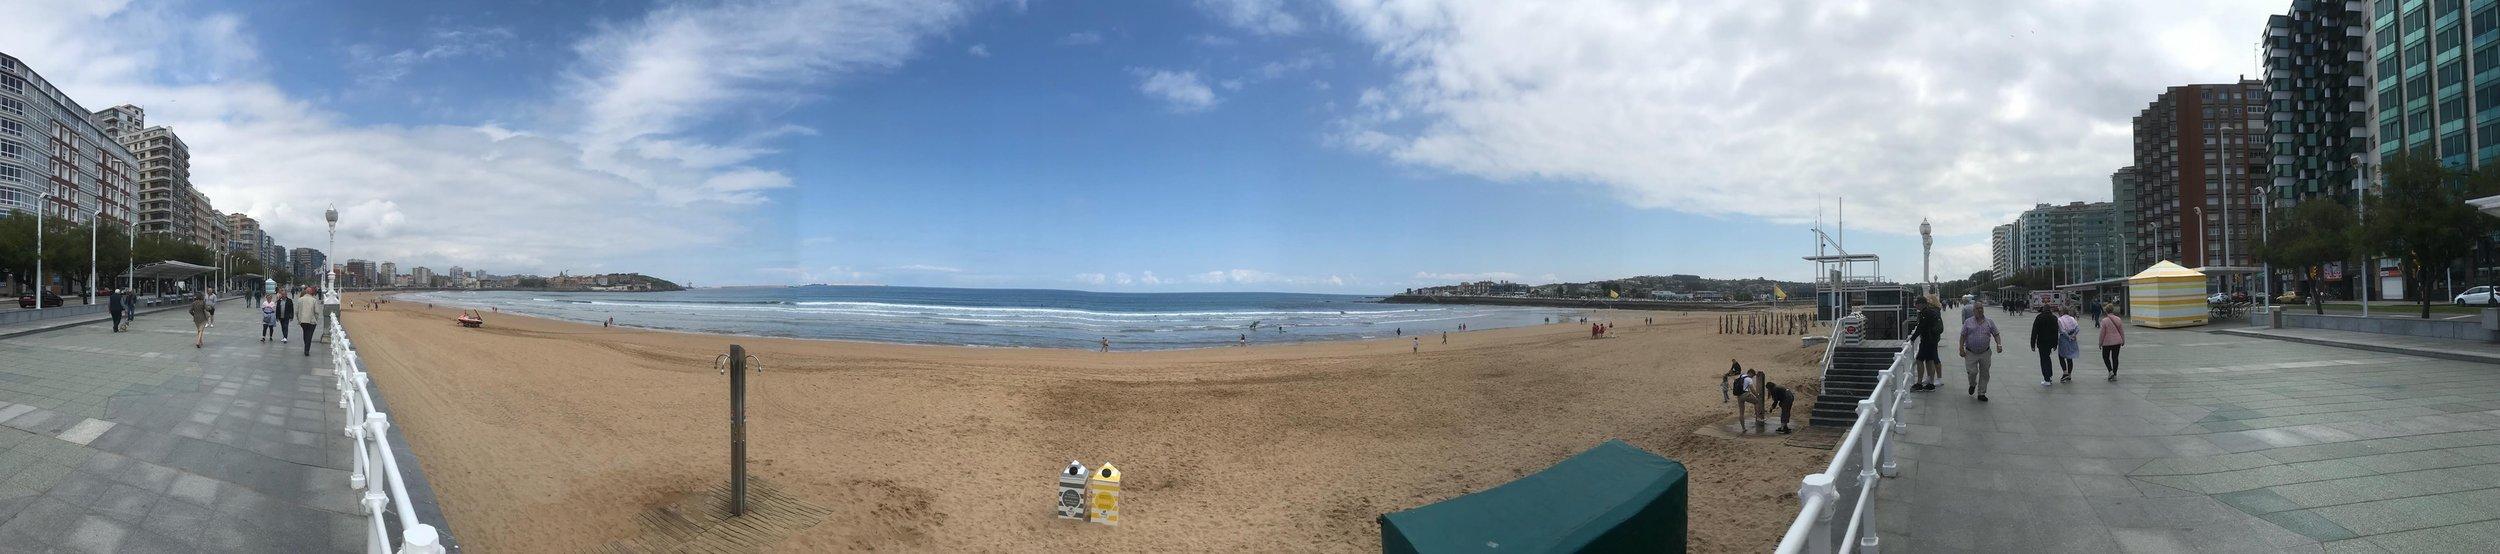 panoramixa playa gijon.jpg